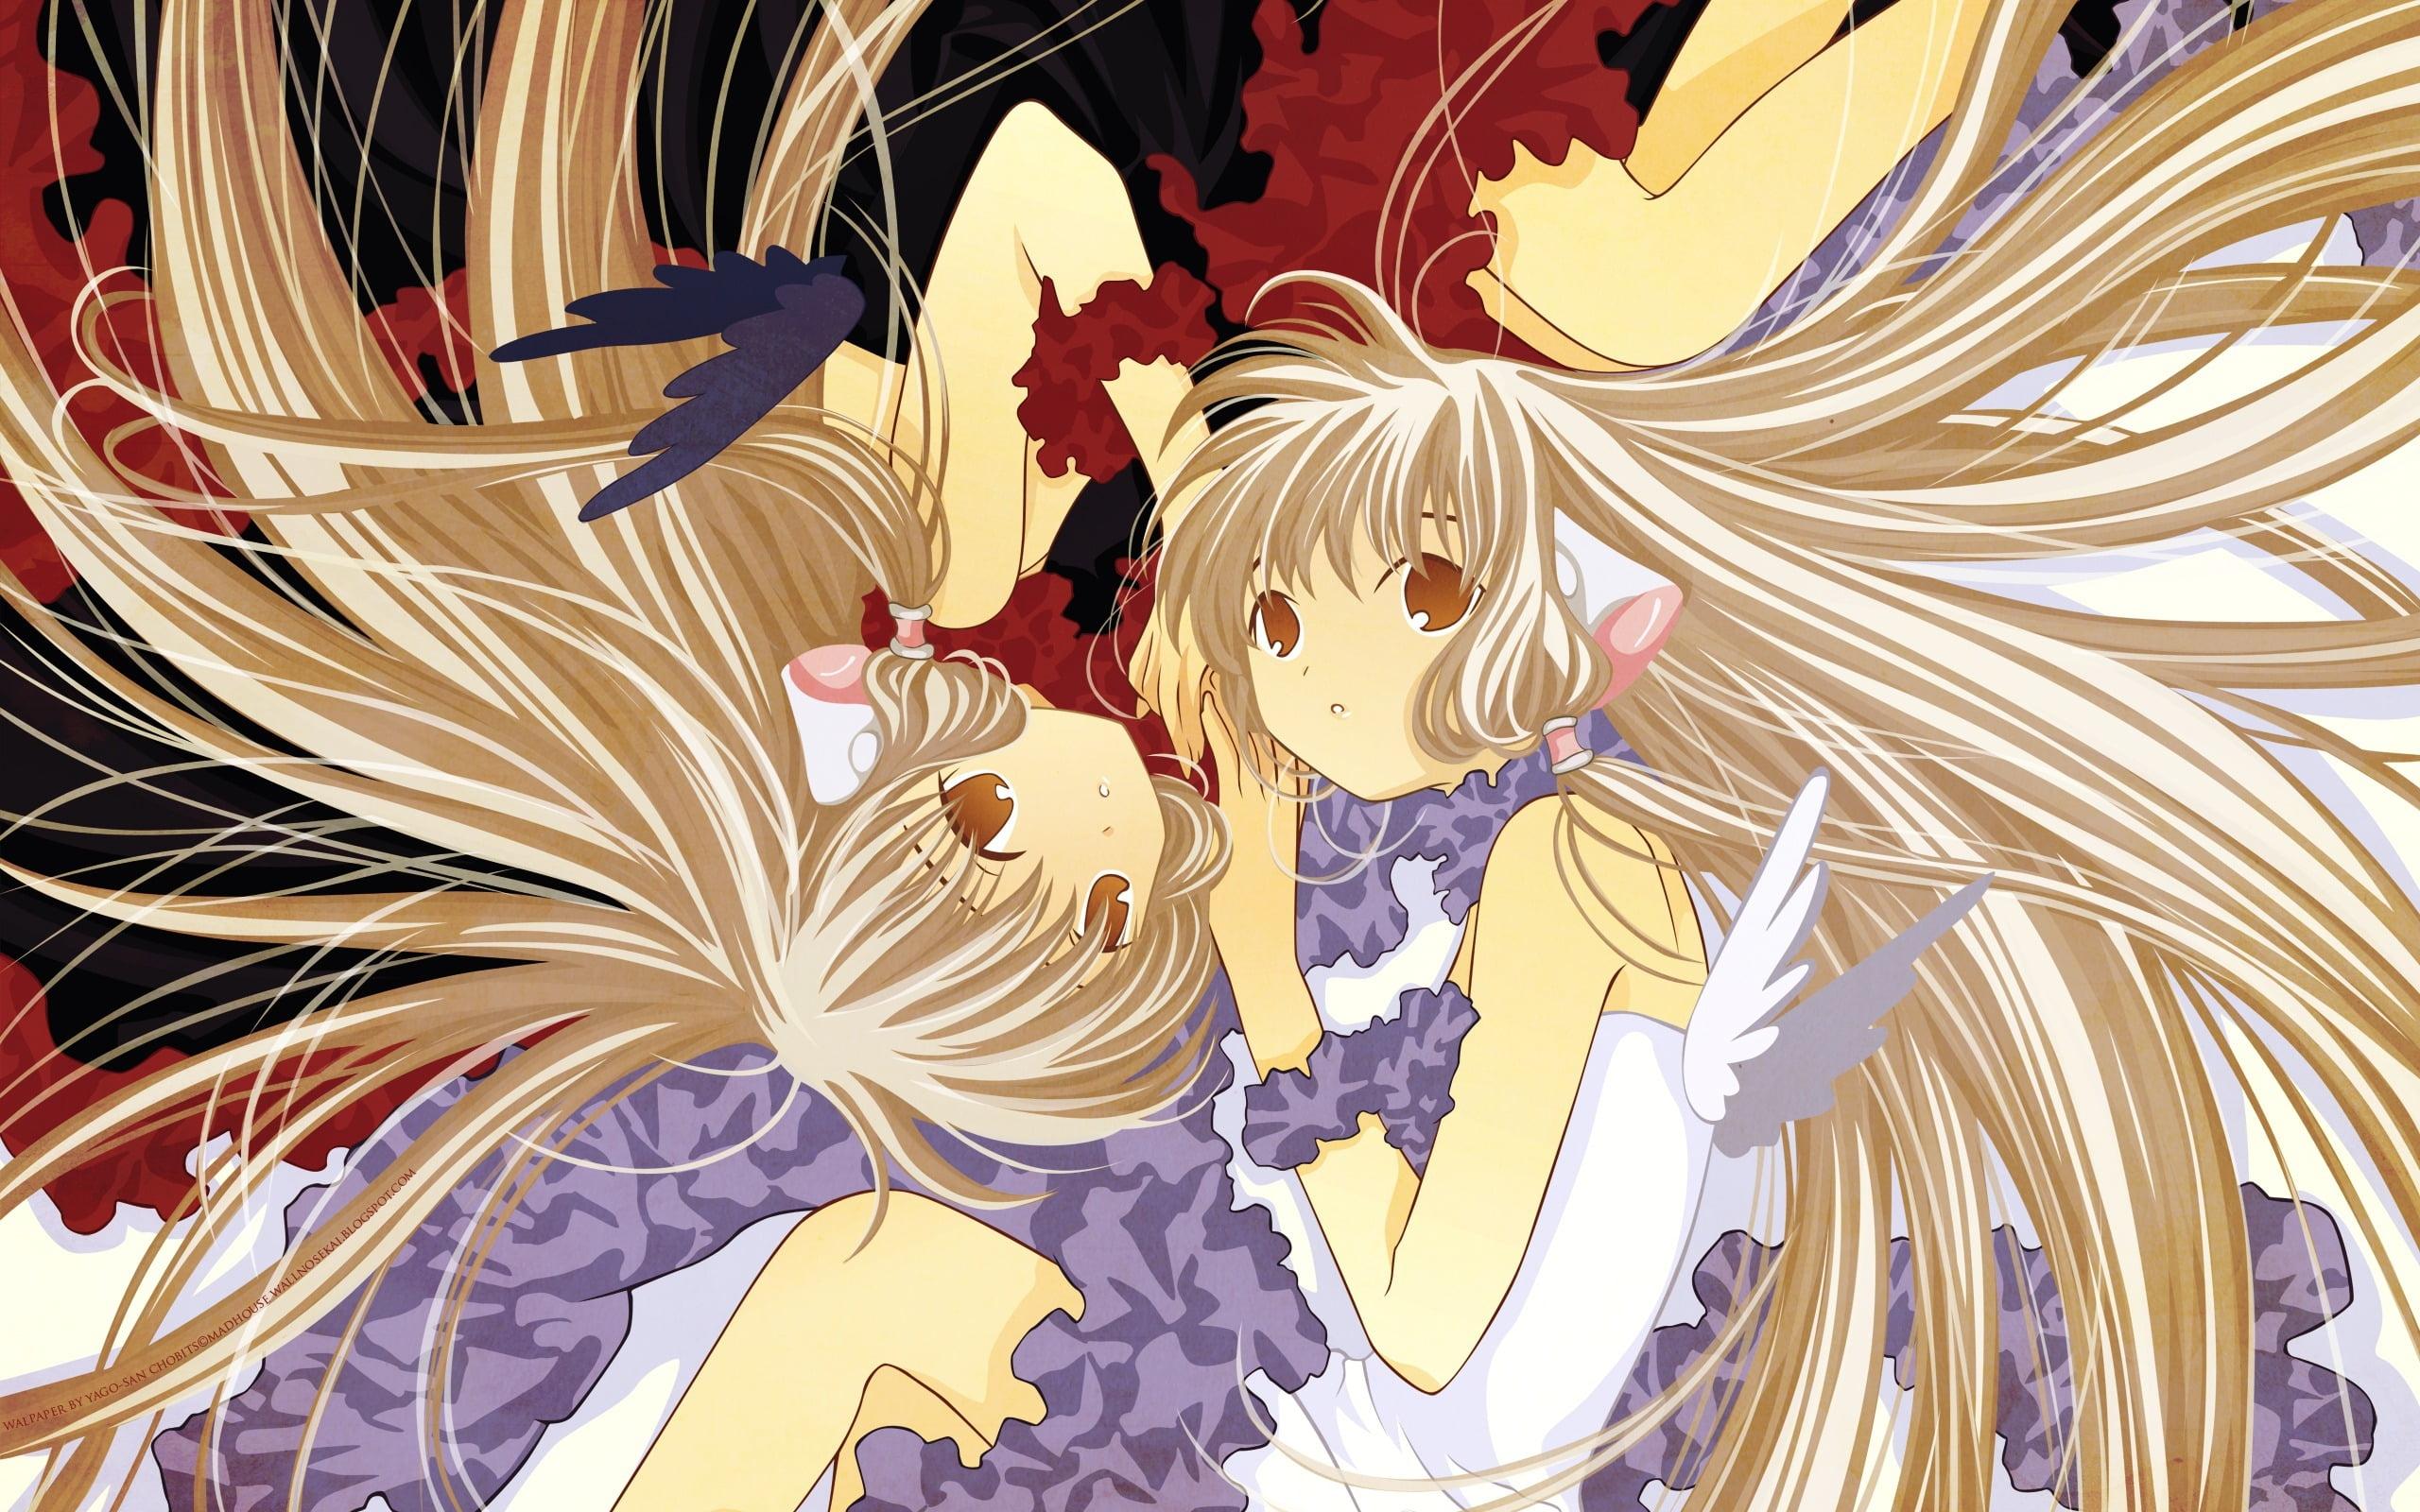 Chobits Anime Cristal Tienda de Anime Manga y Videojuegos